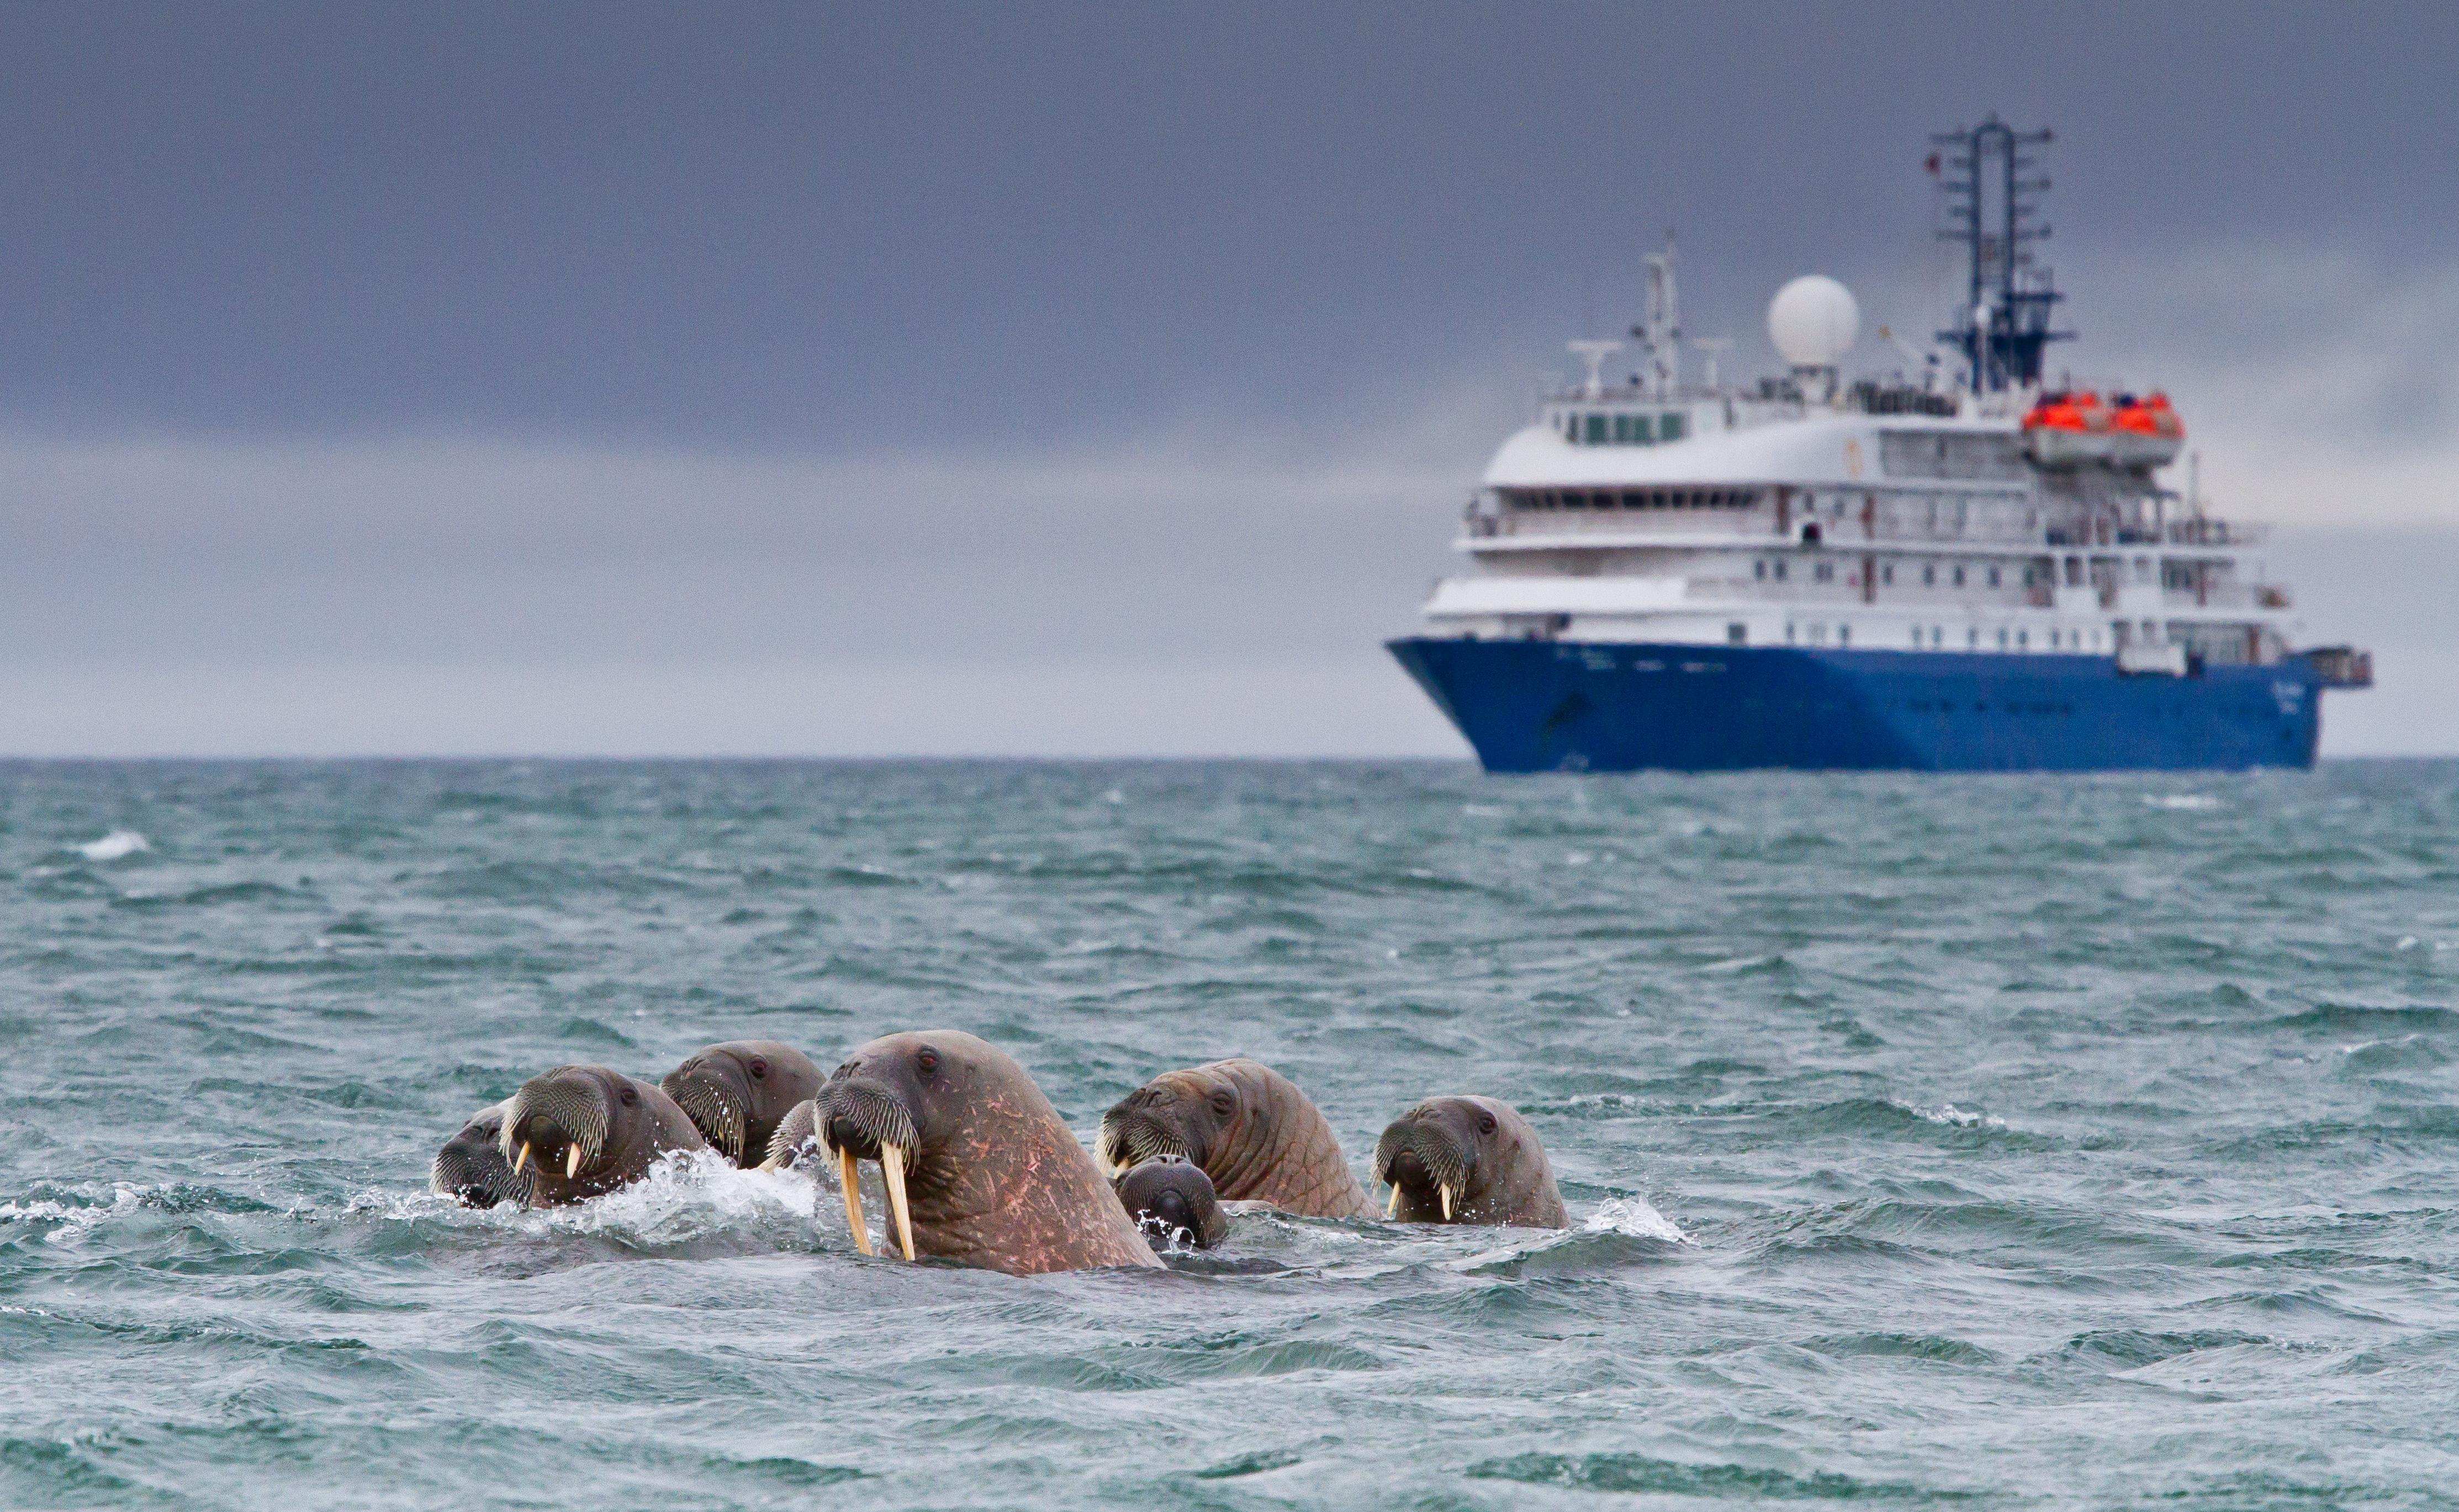 Walruses in the ocean